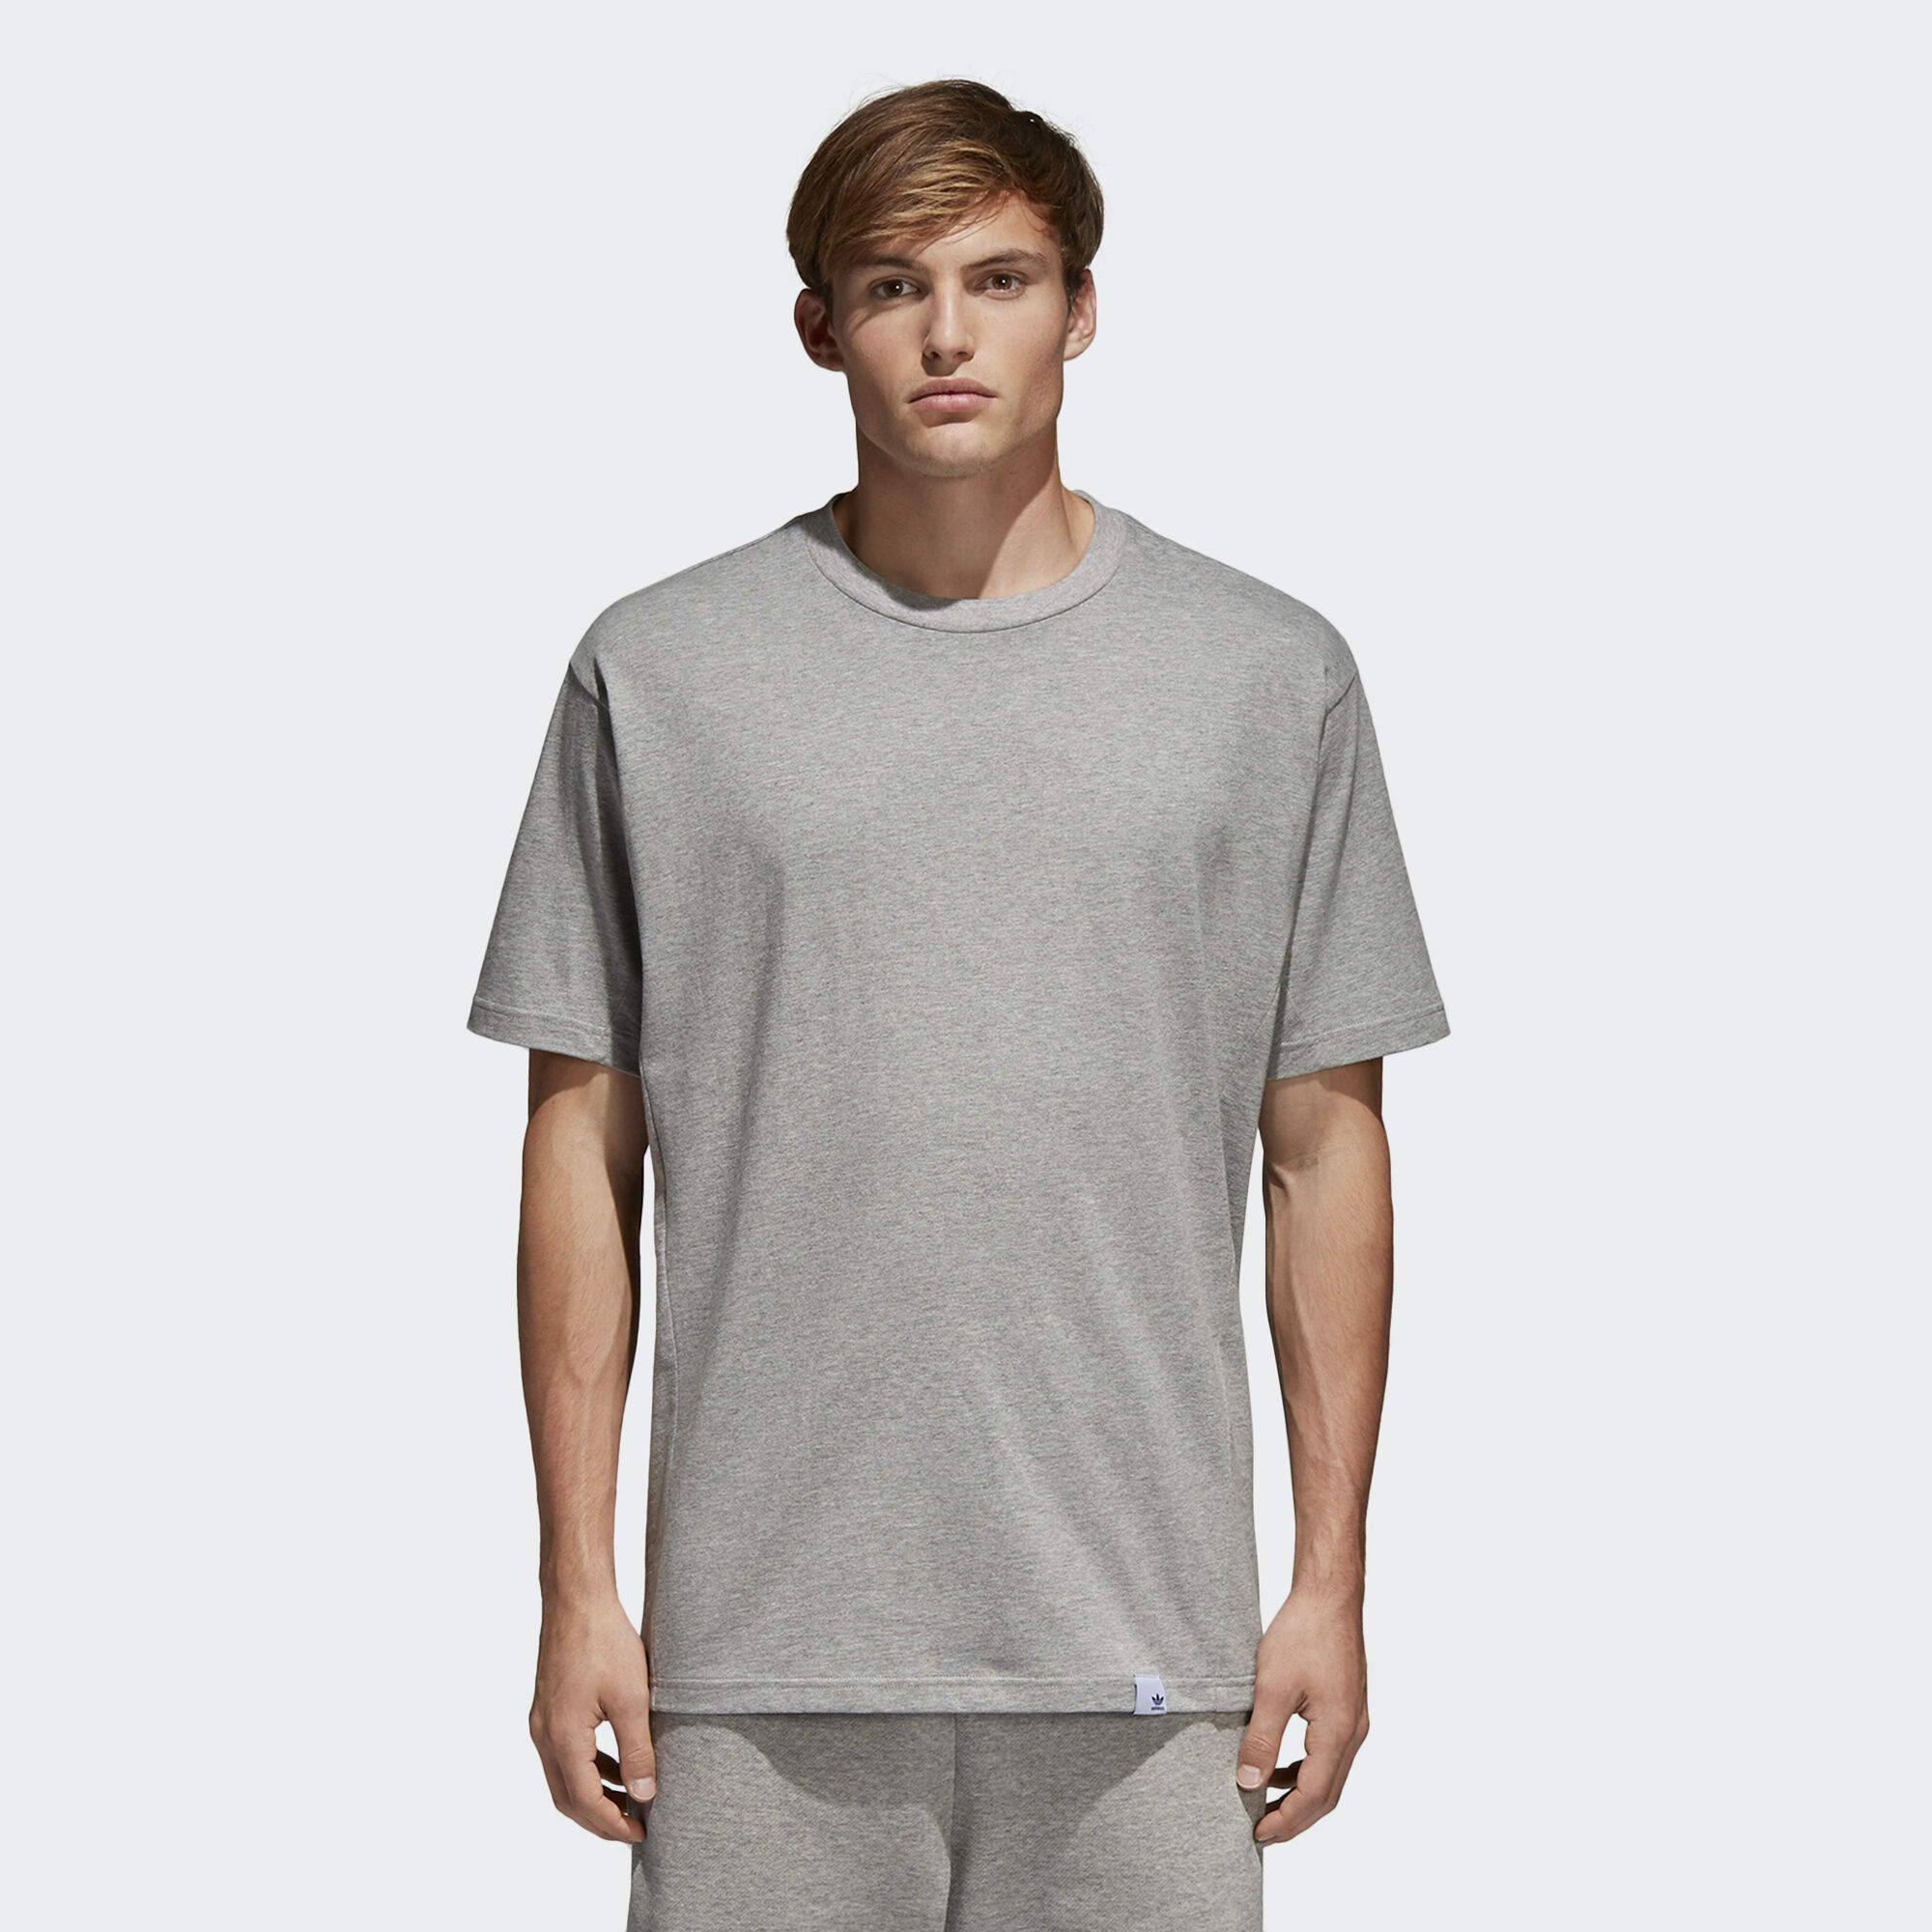 Adidas shirt design your own - Adidas Xbyo Tee Medium Grey Heather Bq3050